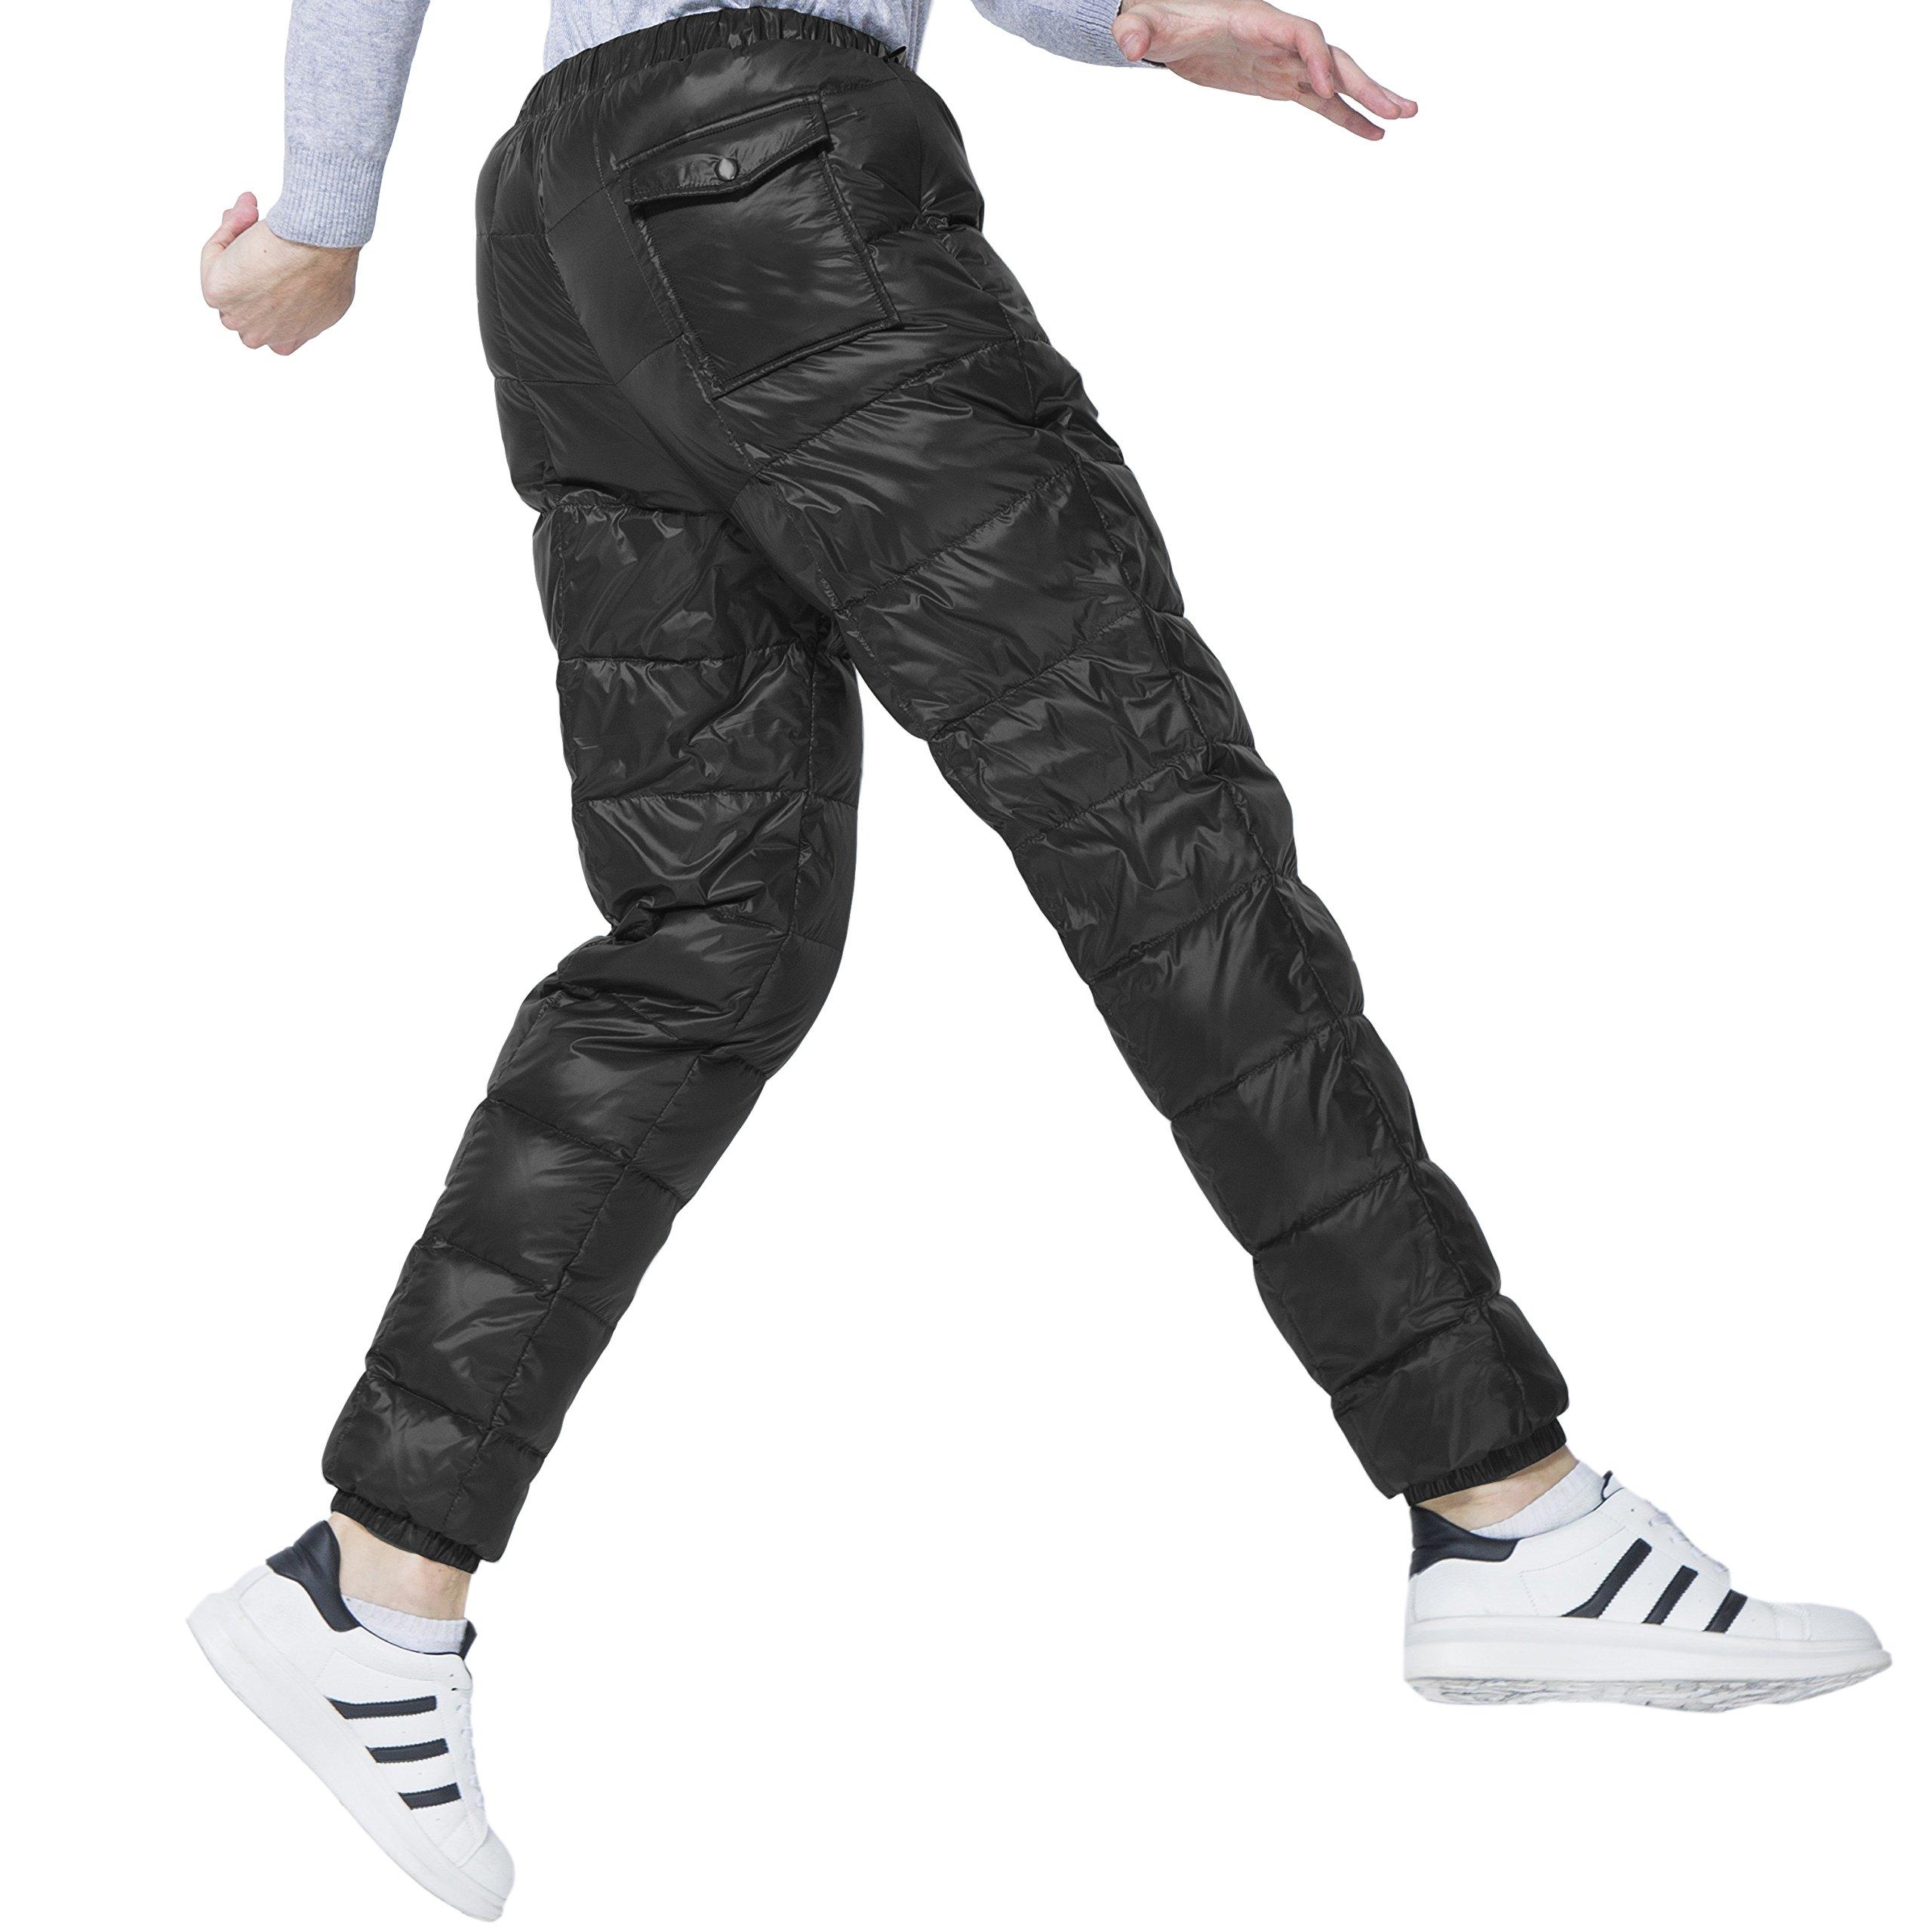 QIYU PANLTCY Men's Packable Down Puffer Pants Winter Warm Lightweight Snow Trousers (Small, Black)